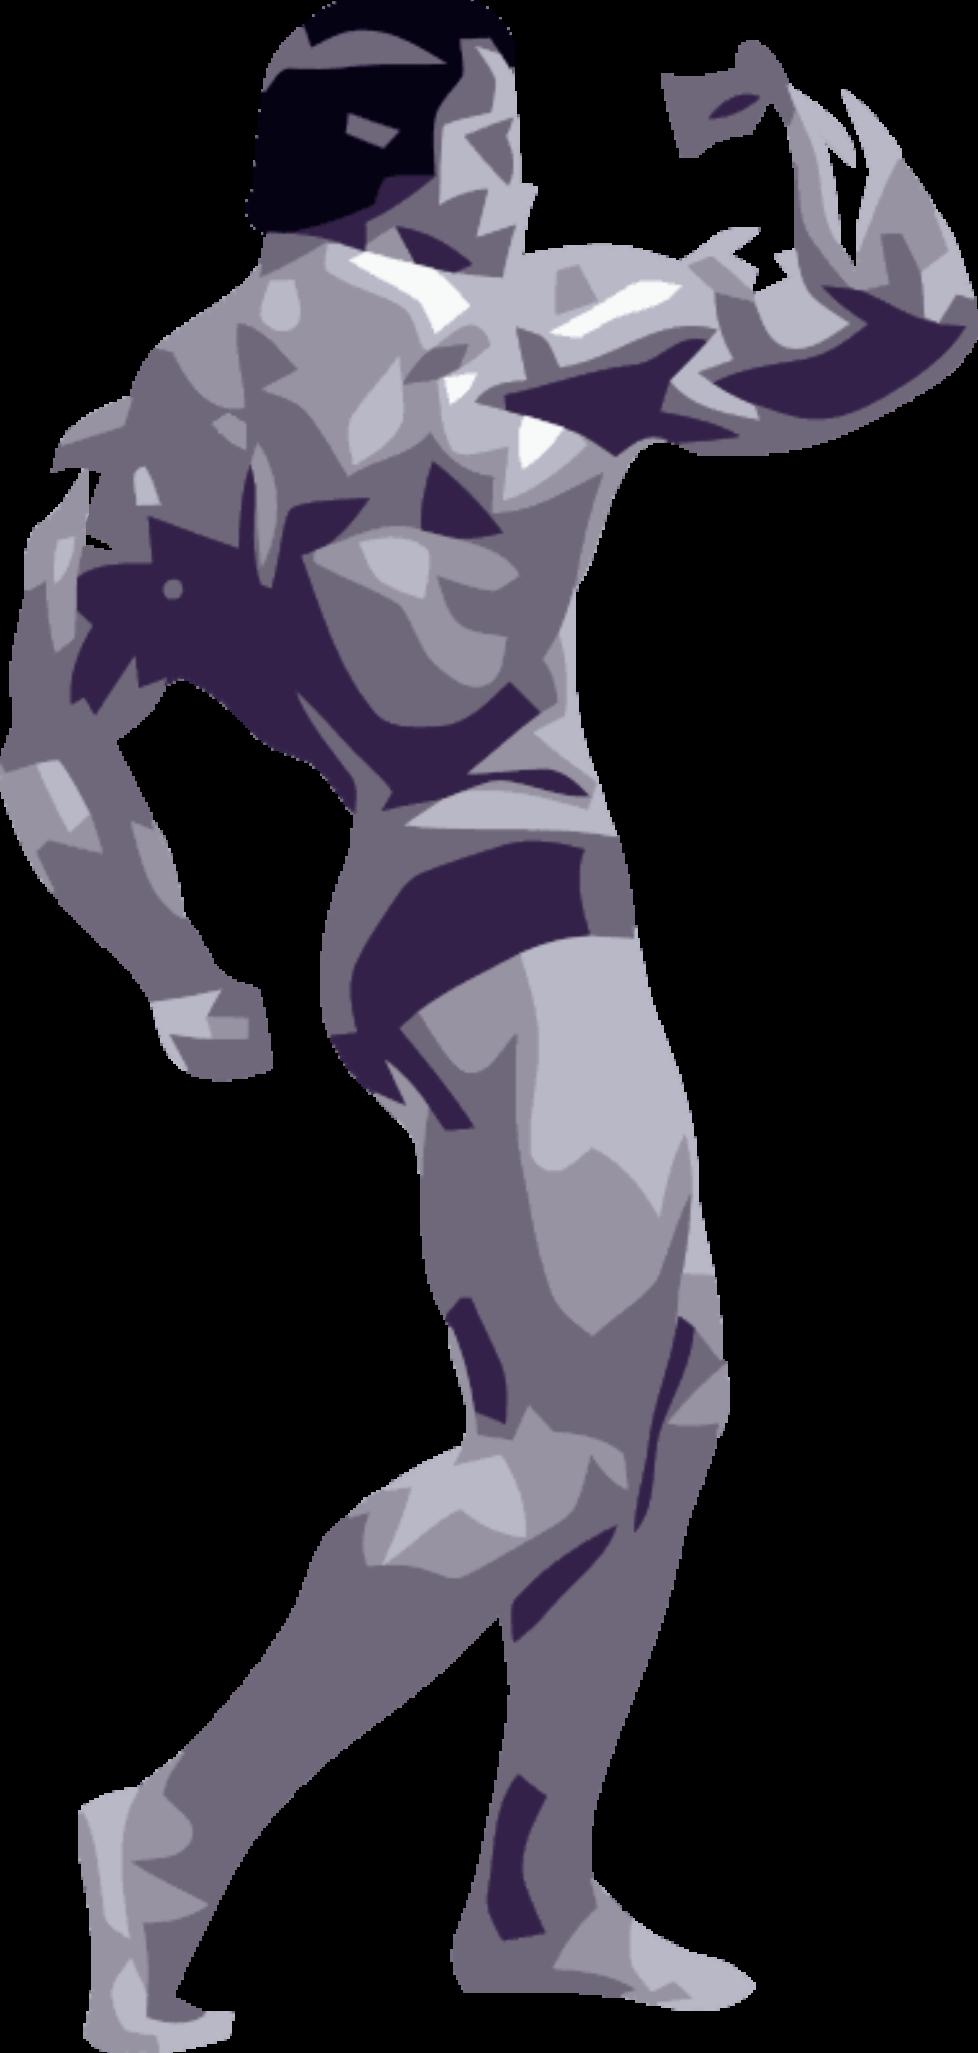 SRD-Posing-Bodybuilder-800px